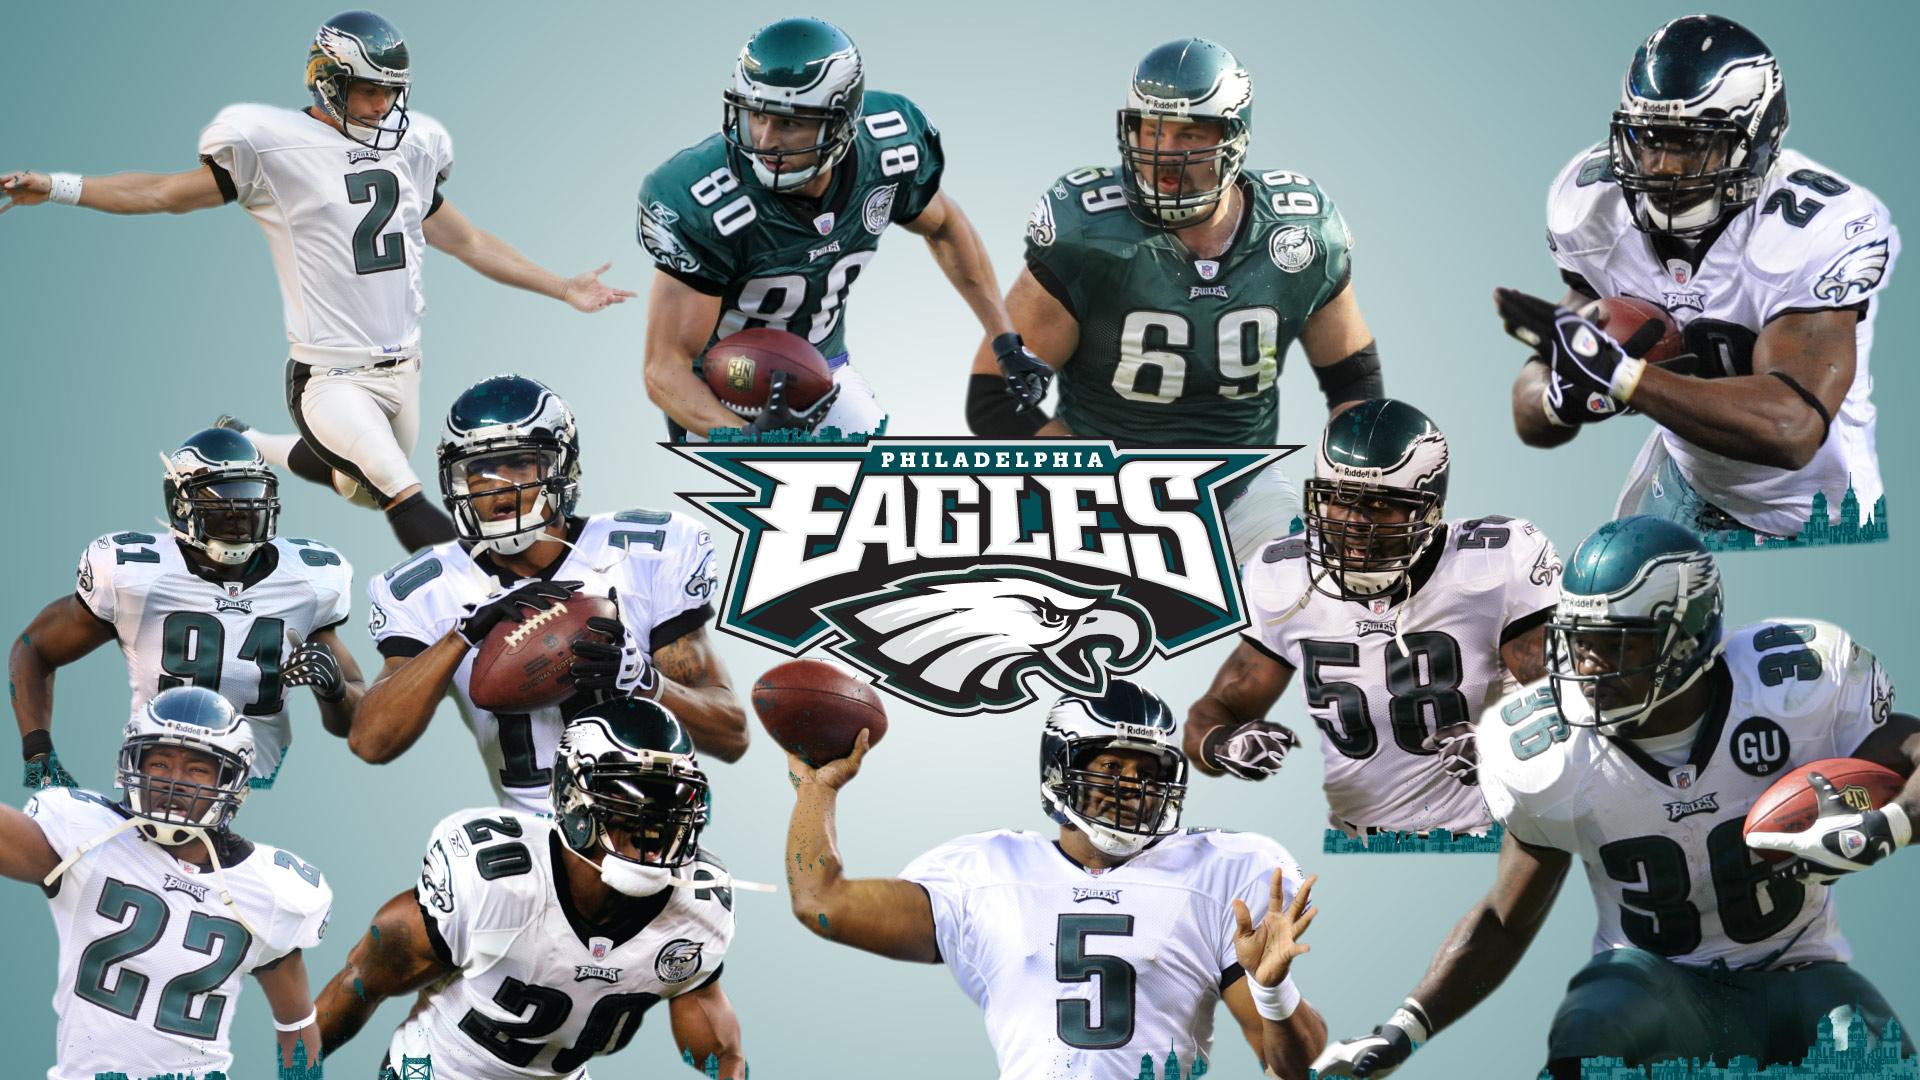 Philadelphia Eagles Hd Walpaper HD Wallpapers HD Backgrounds 1920x1080